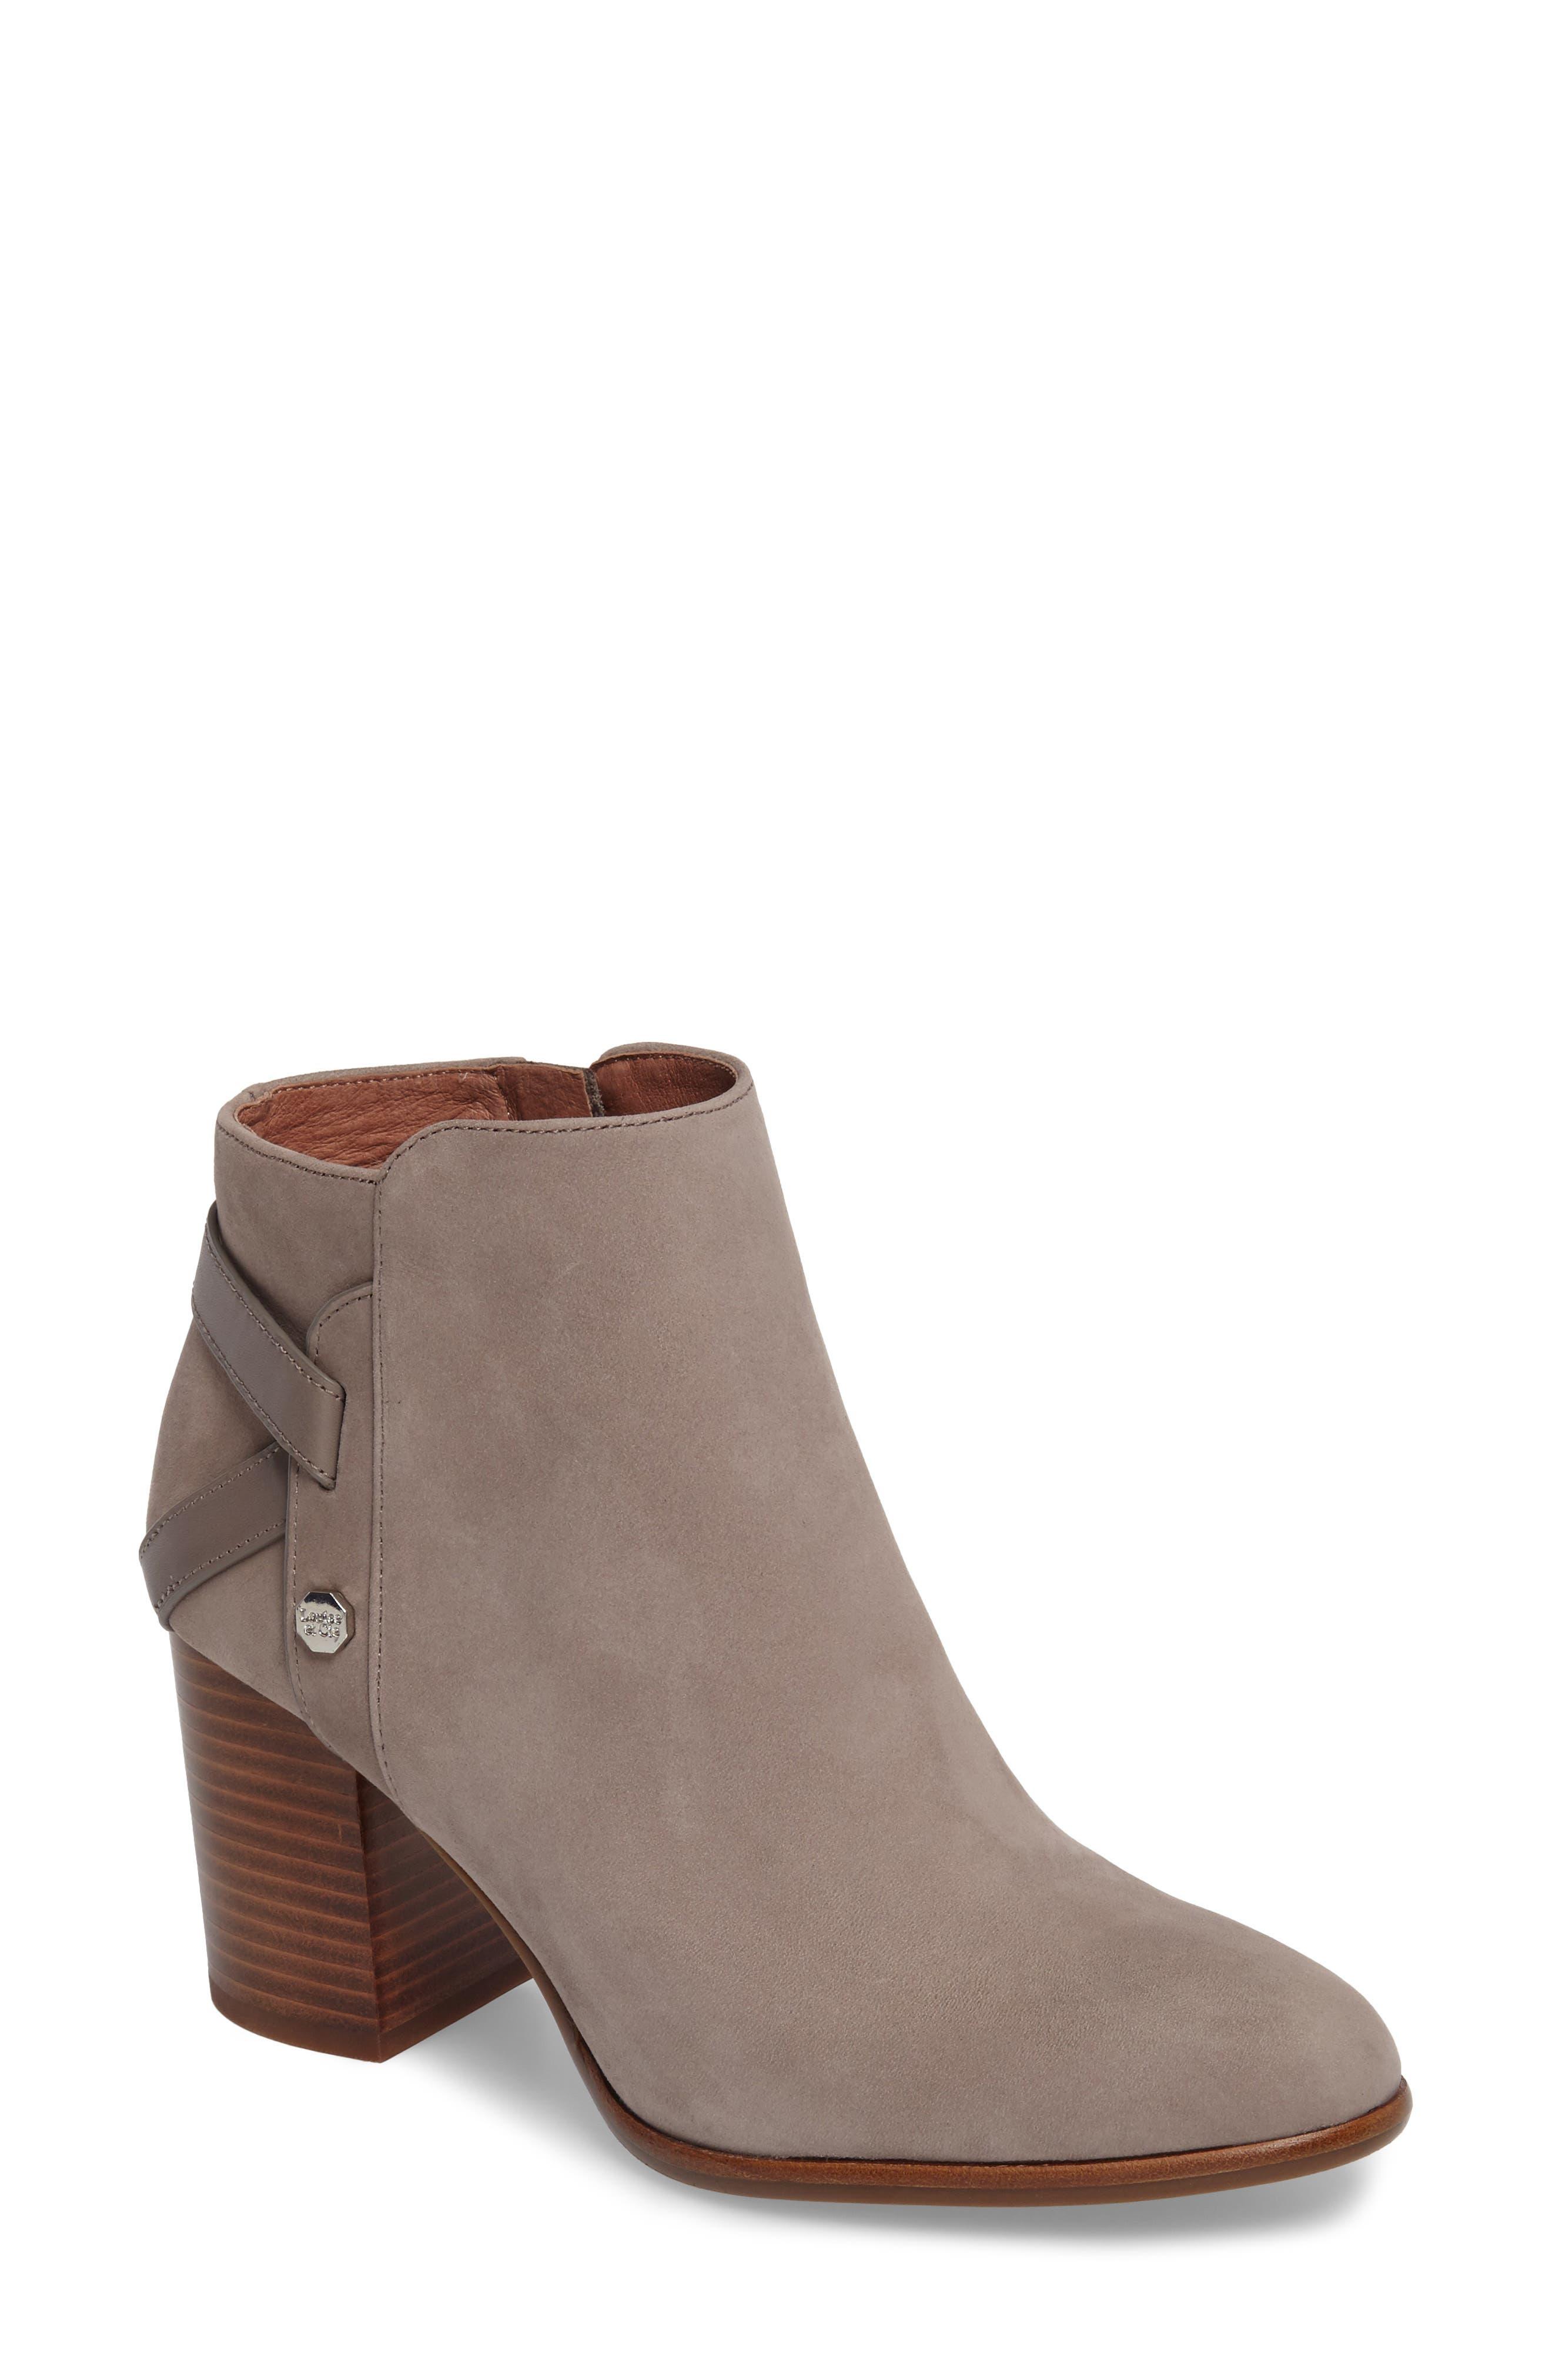 Zanara Bootie,                         Main,                         color, Gravel Leather